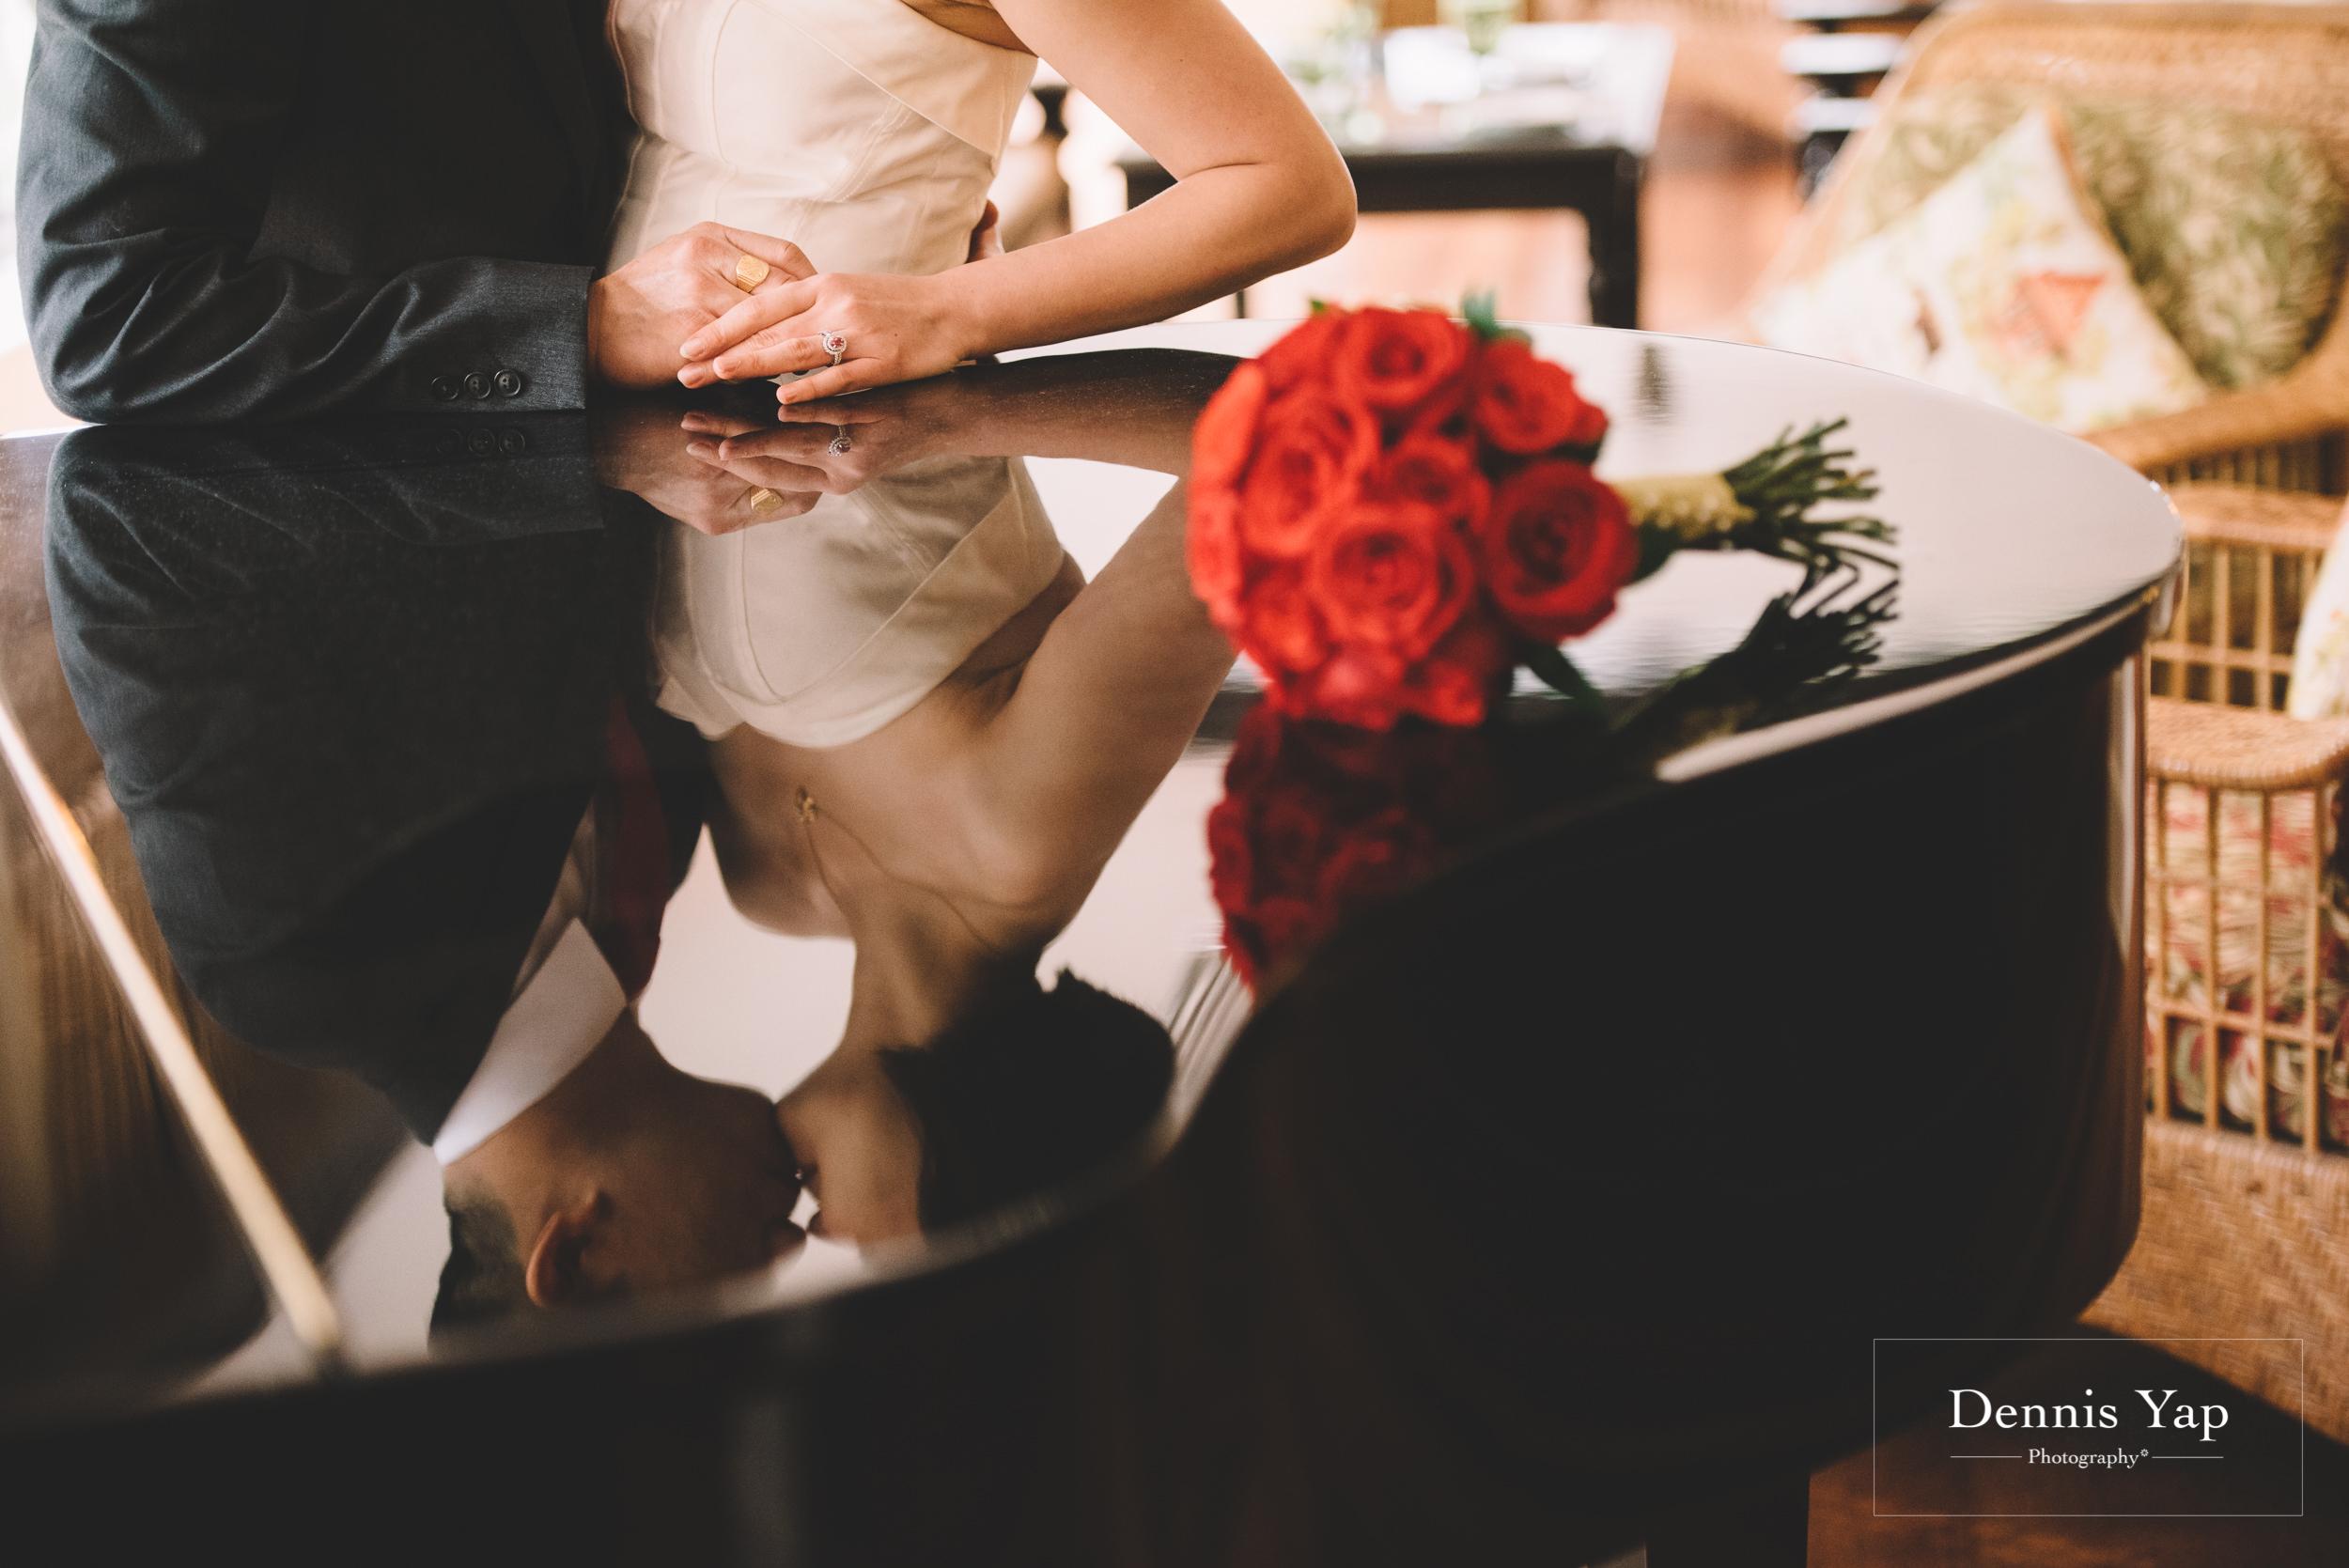 boon weng cyndy love family values pre wedding cameron highlands smoke house dennis yap photography-70.jpg